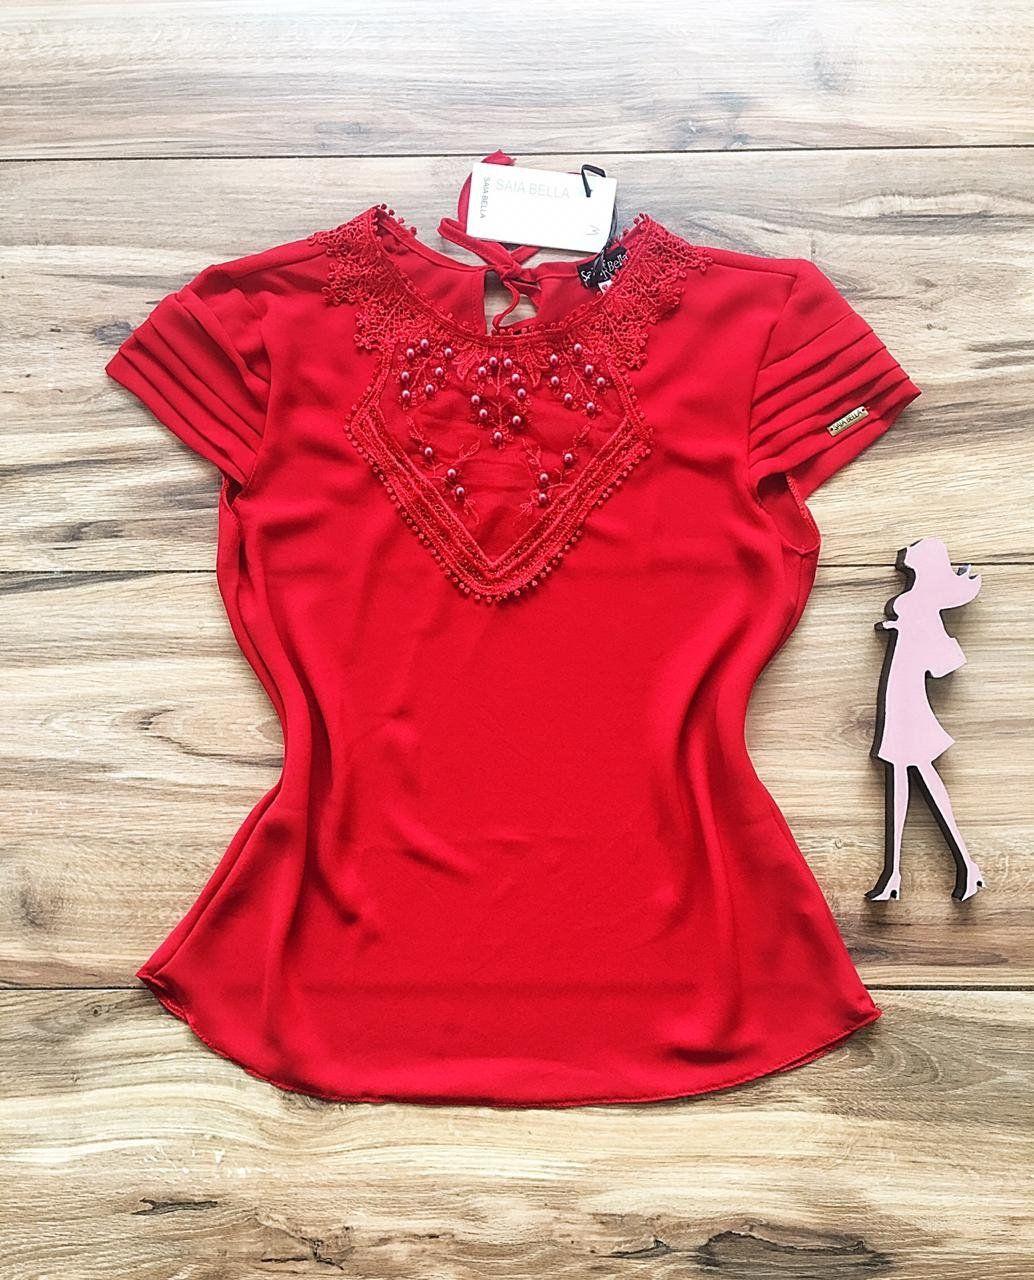 Blusa de Renda Saia Bella - SB9966 vermelho